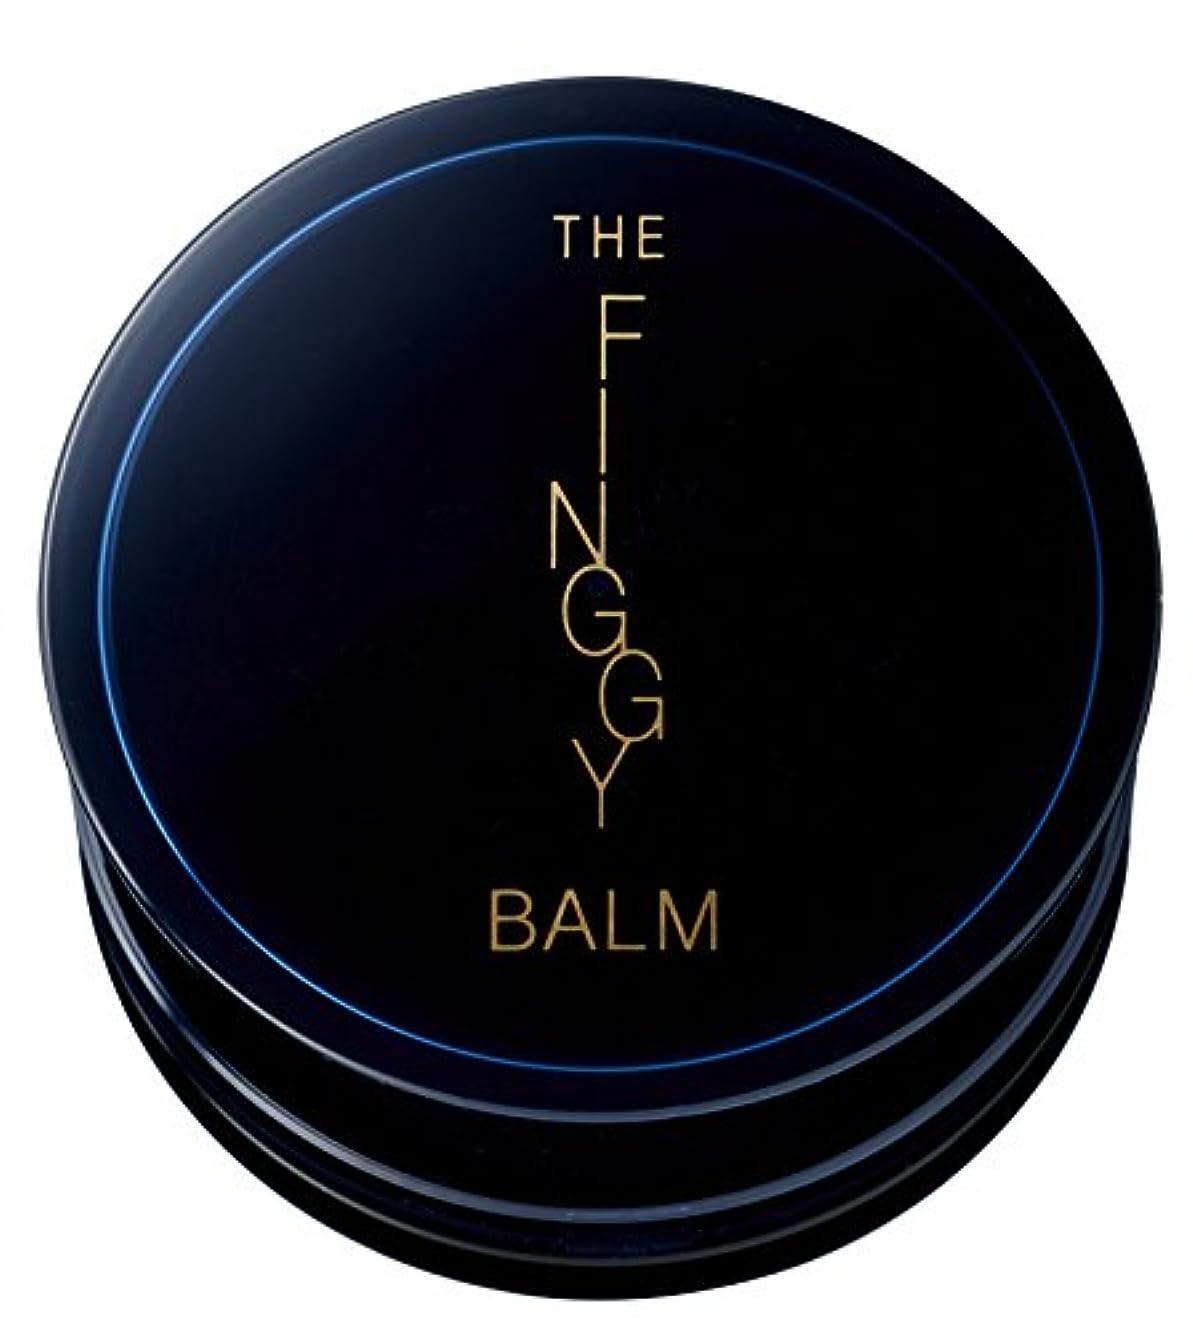 FINGGY BALM スキンプロテクター